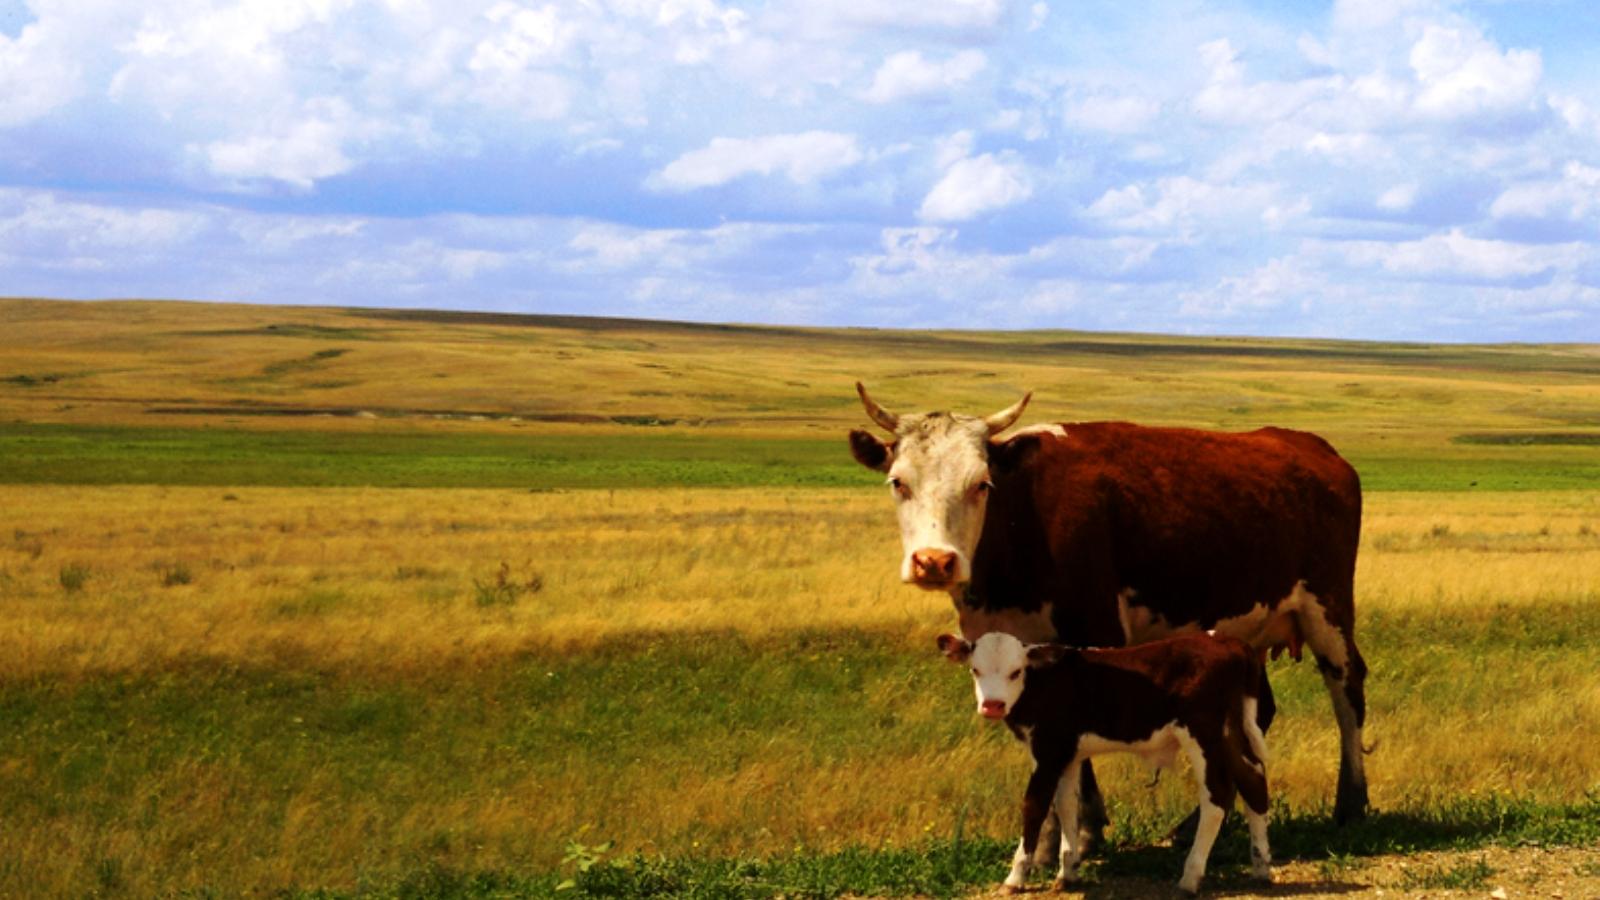 Картинка корова с теленком